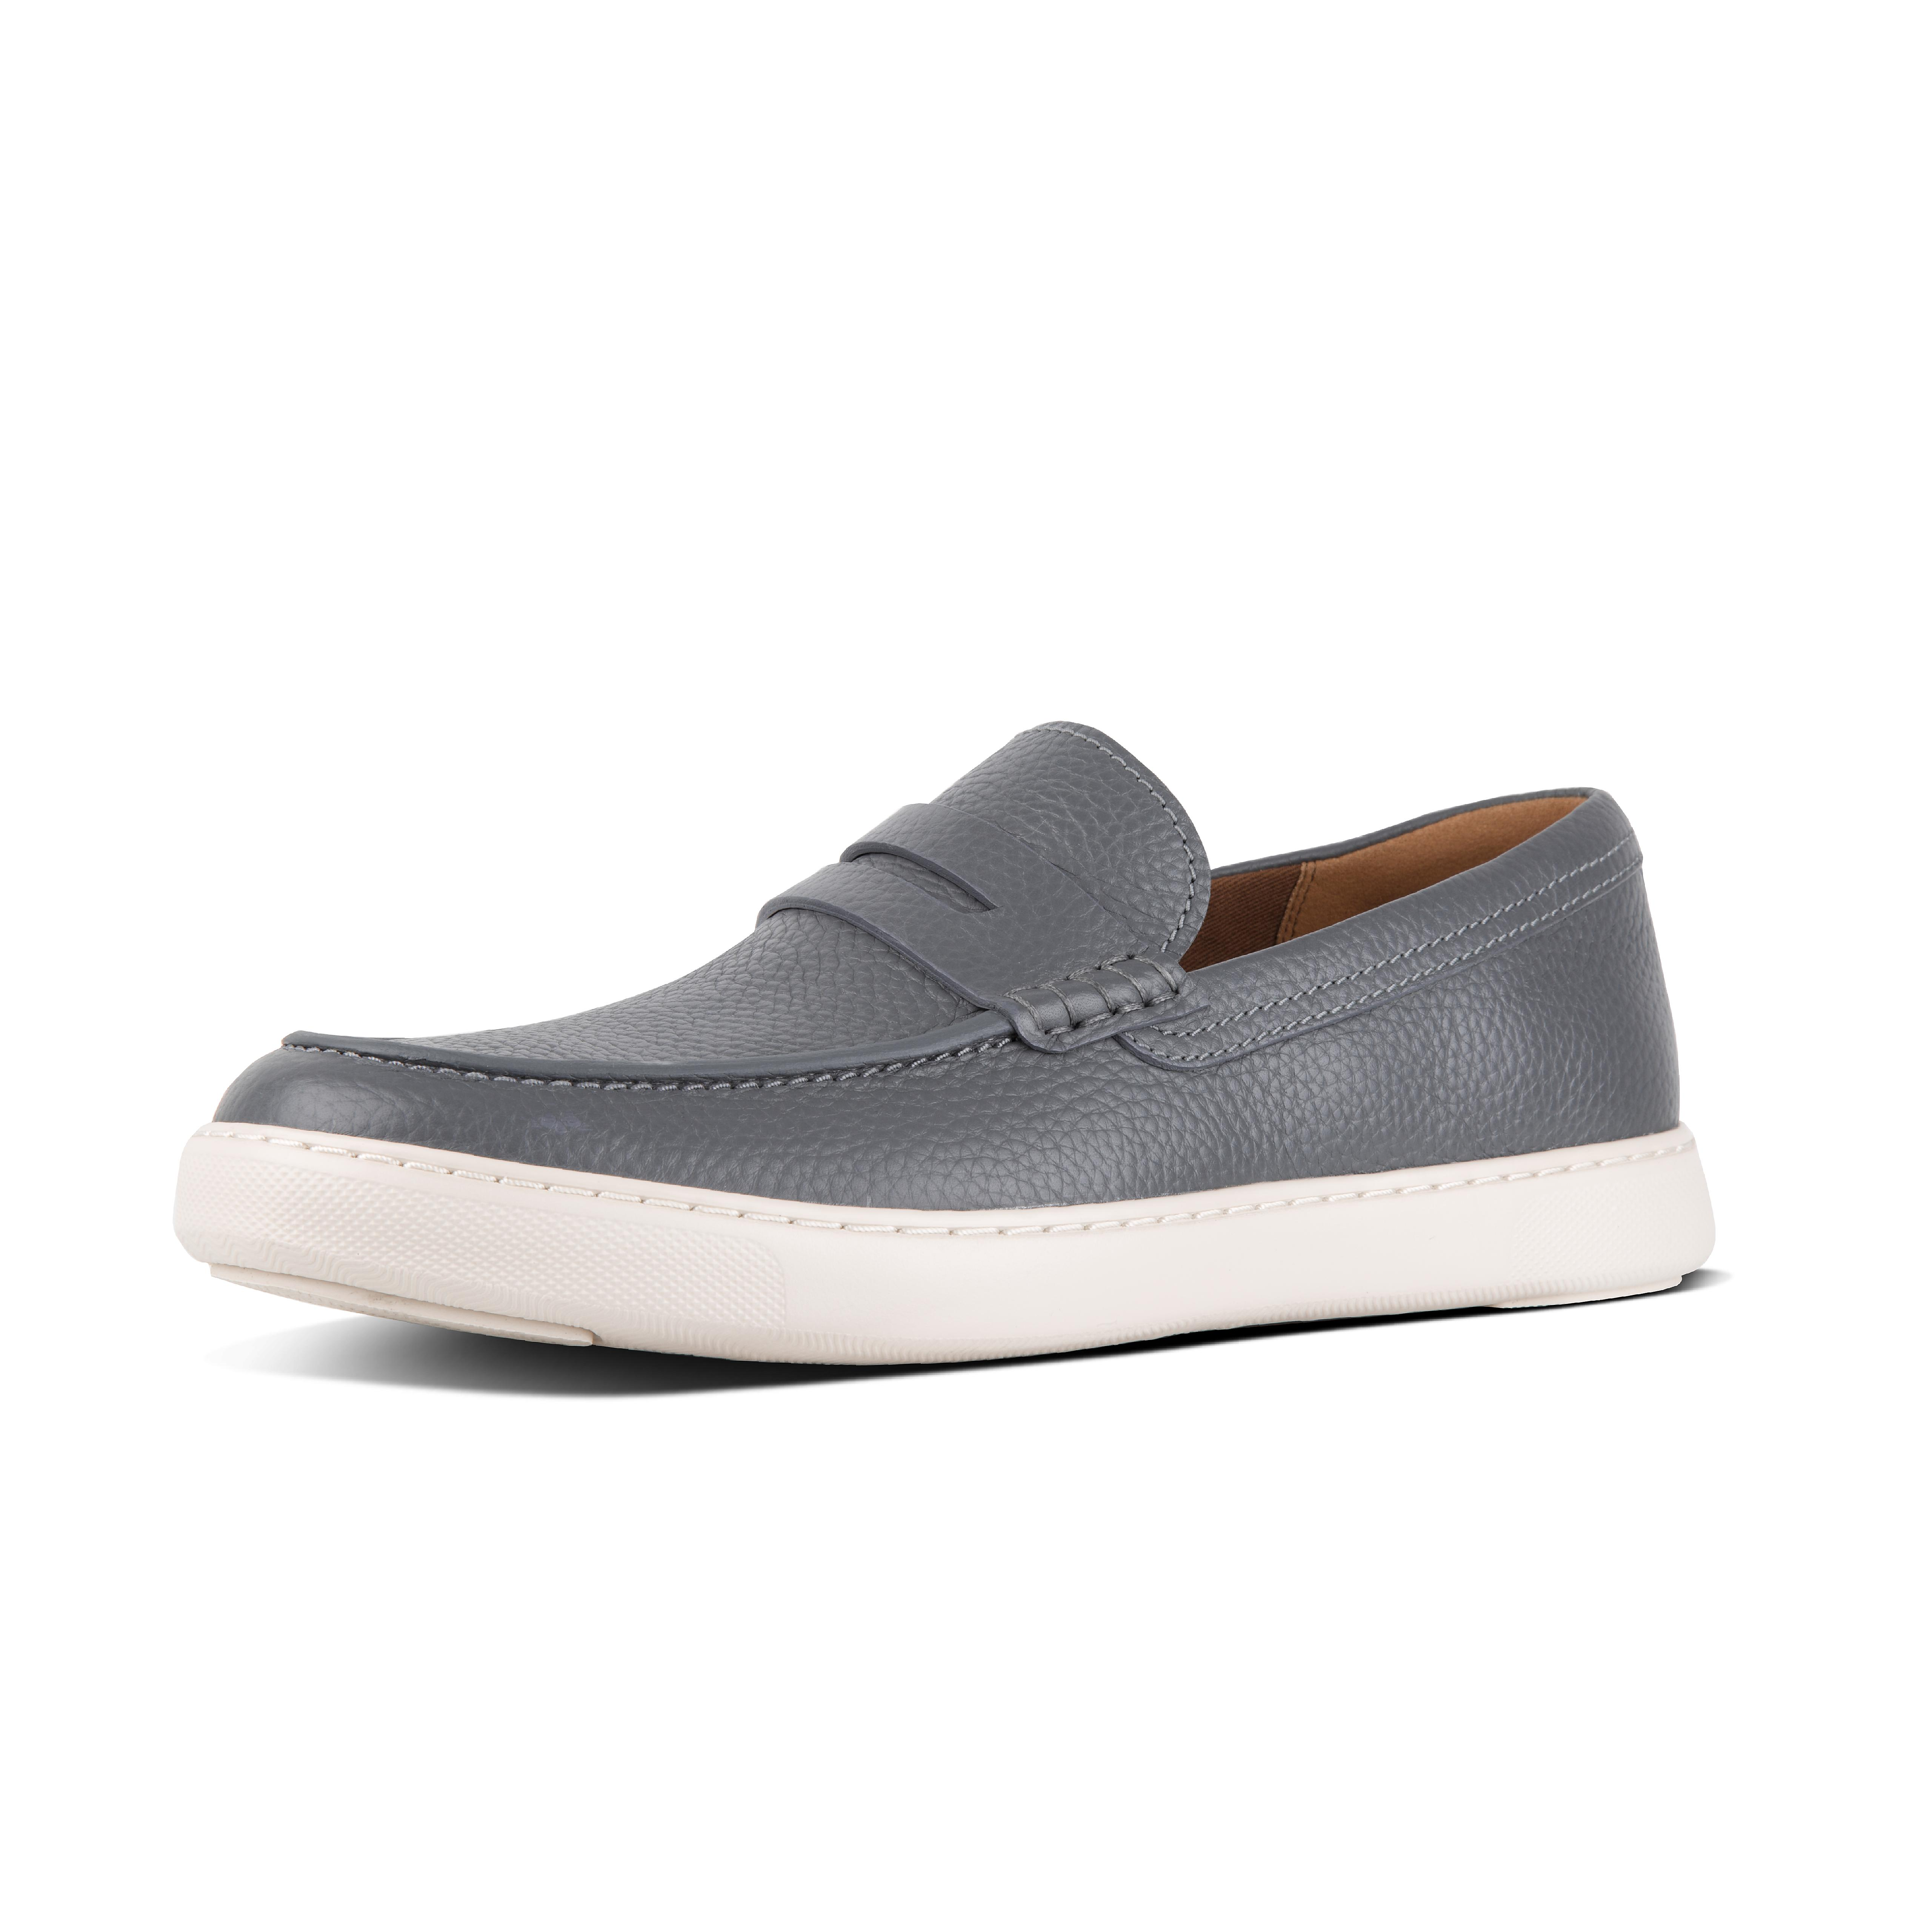 Boston leather loafer charcoal grey n08 052?v=3